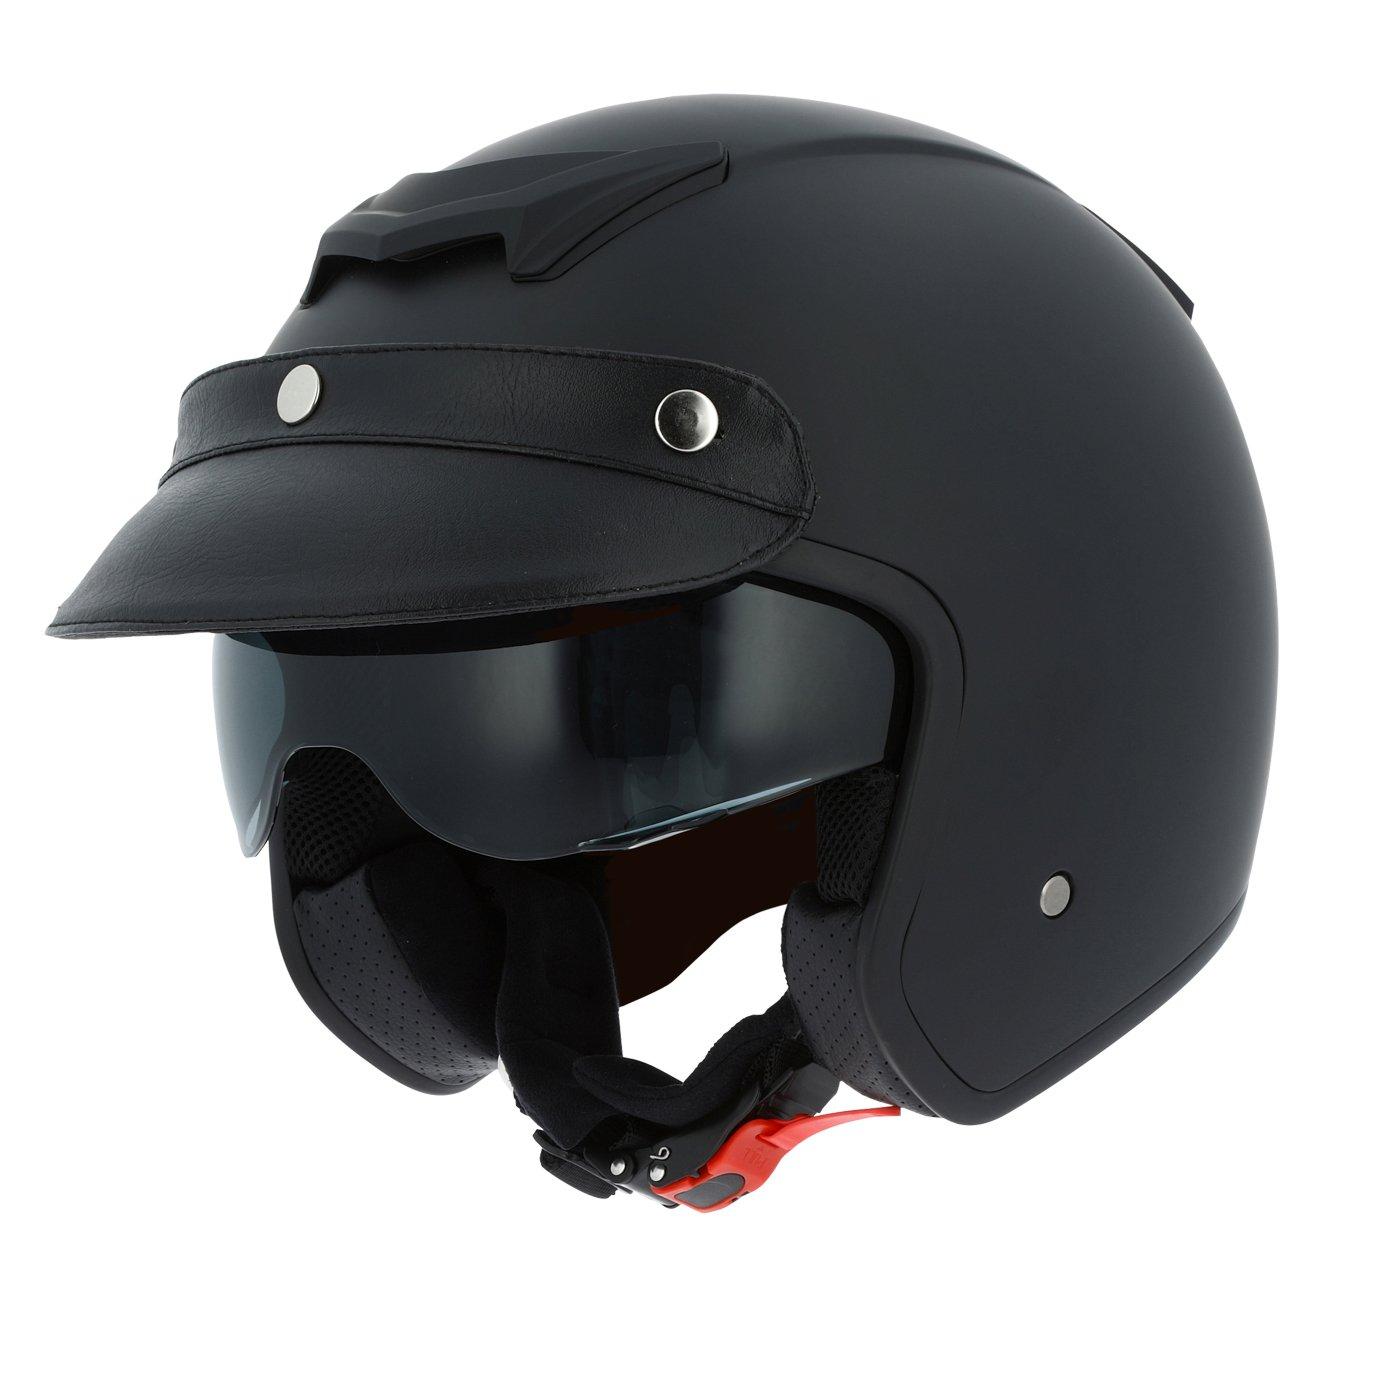 Astone Helmets Casque Moto Jet Sportster, Noir Matt, Taille XL Rider Valley SPORT2M-MBKXL